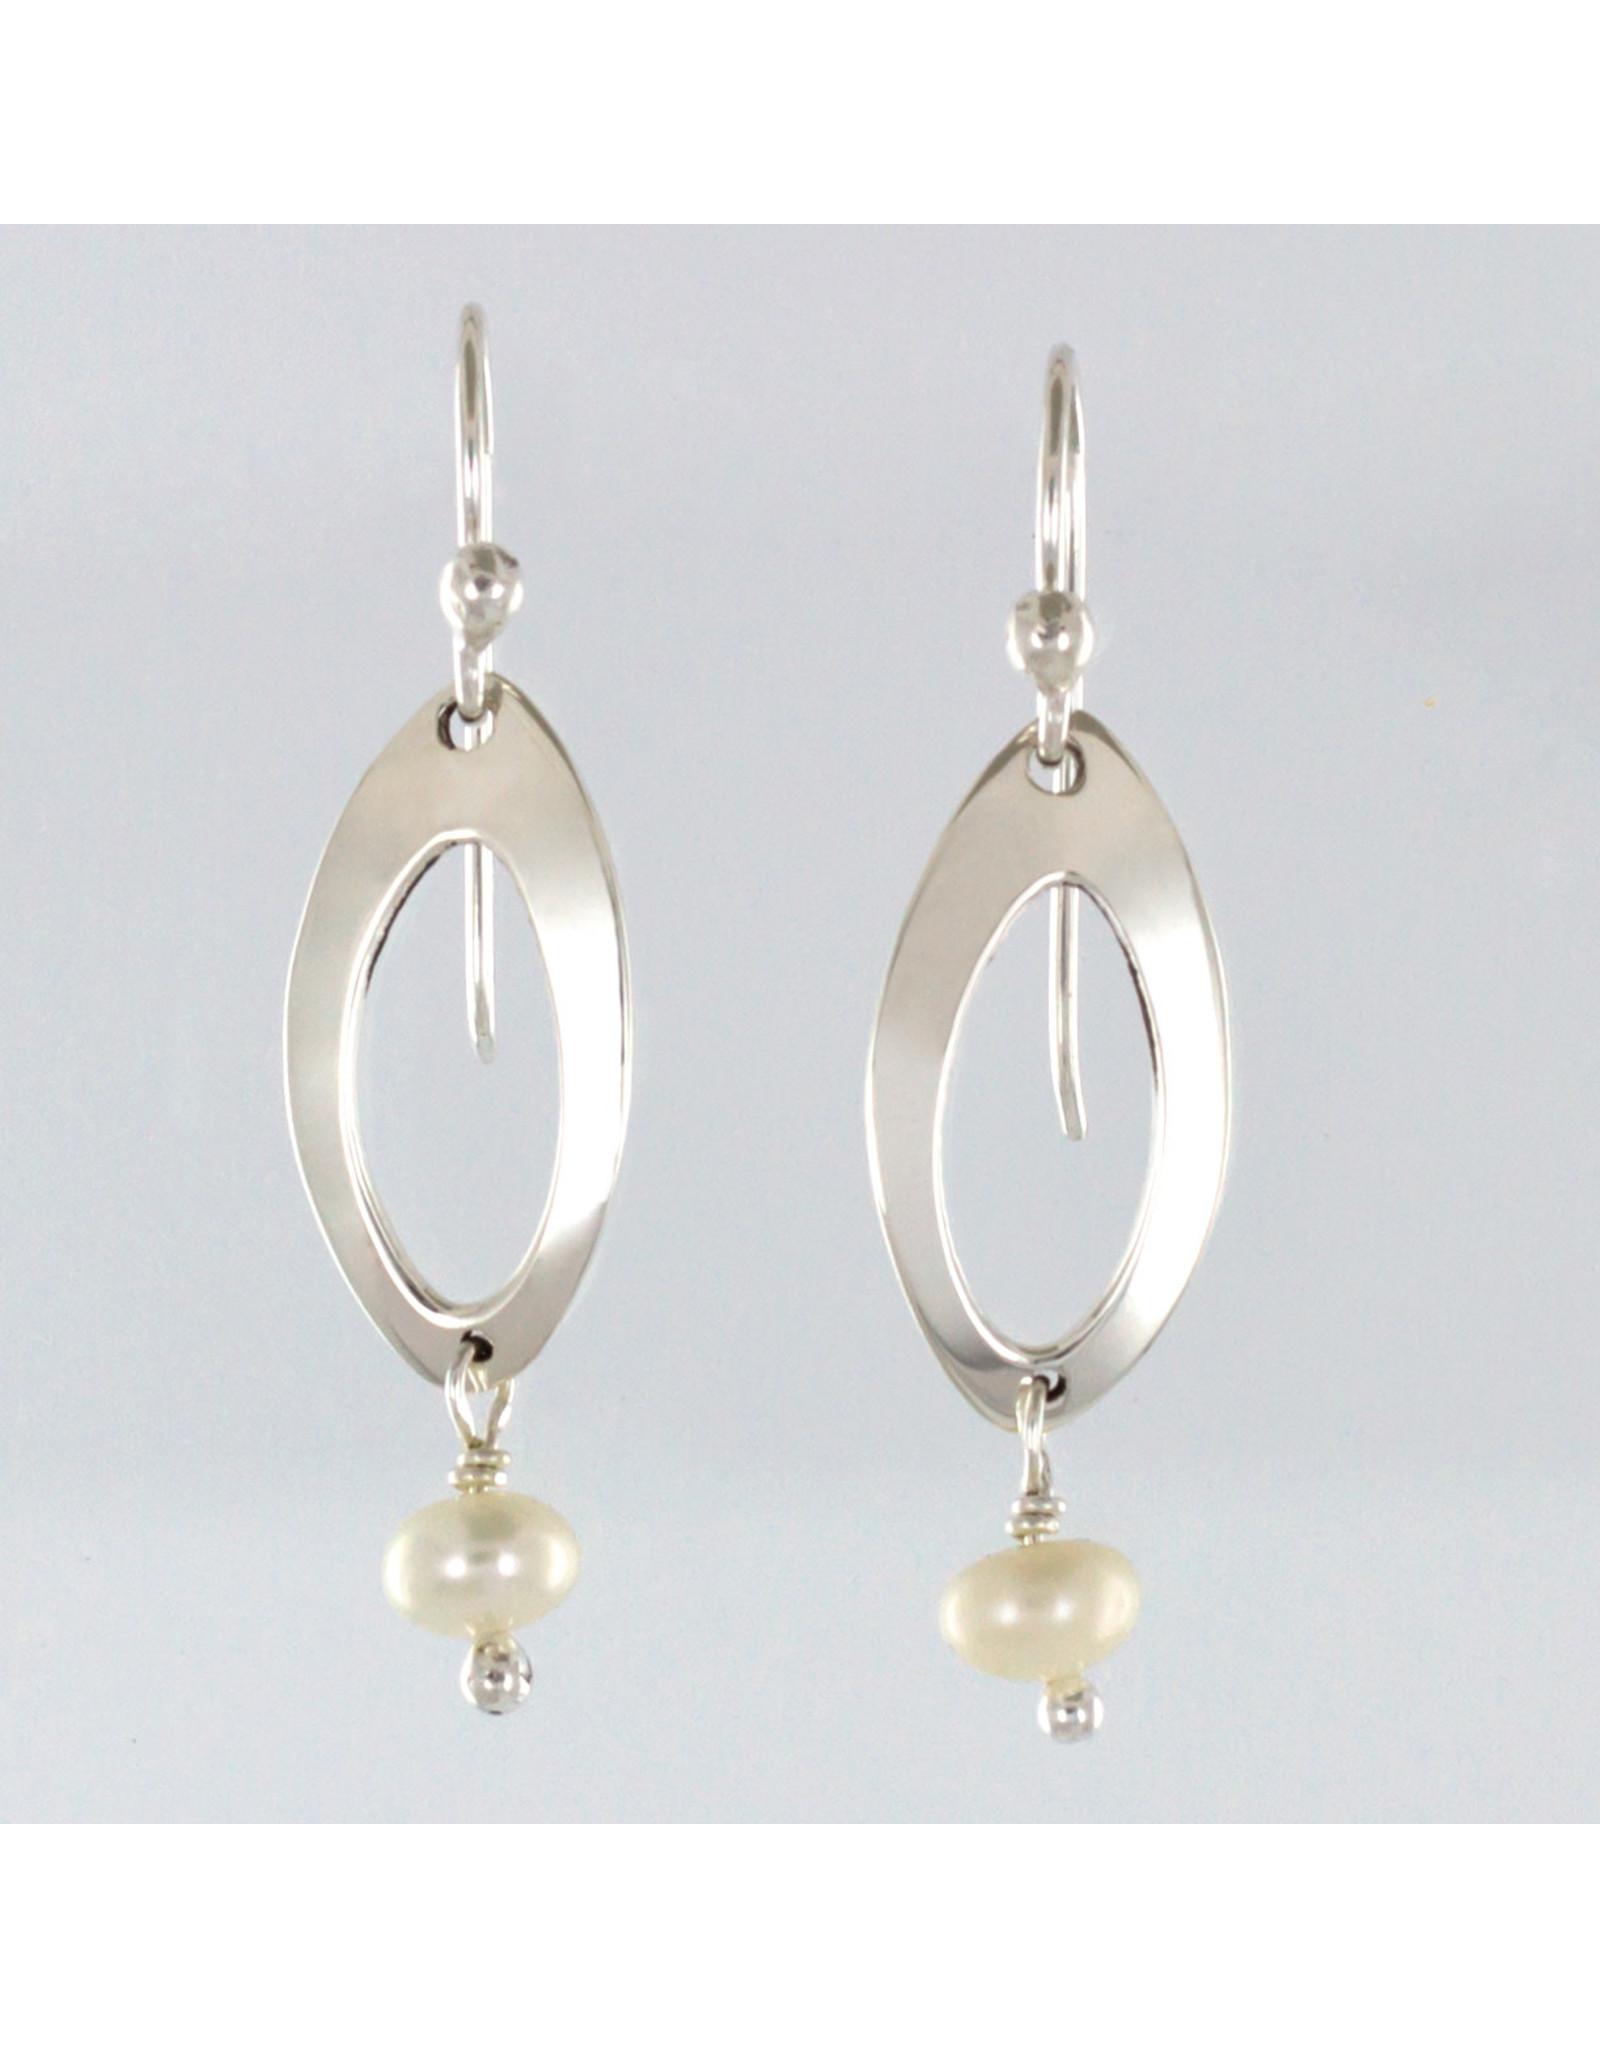 Sterling Oval w/ Freshwater Pearl Earrings, Mexico